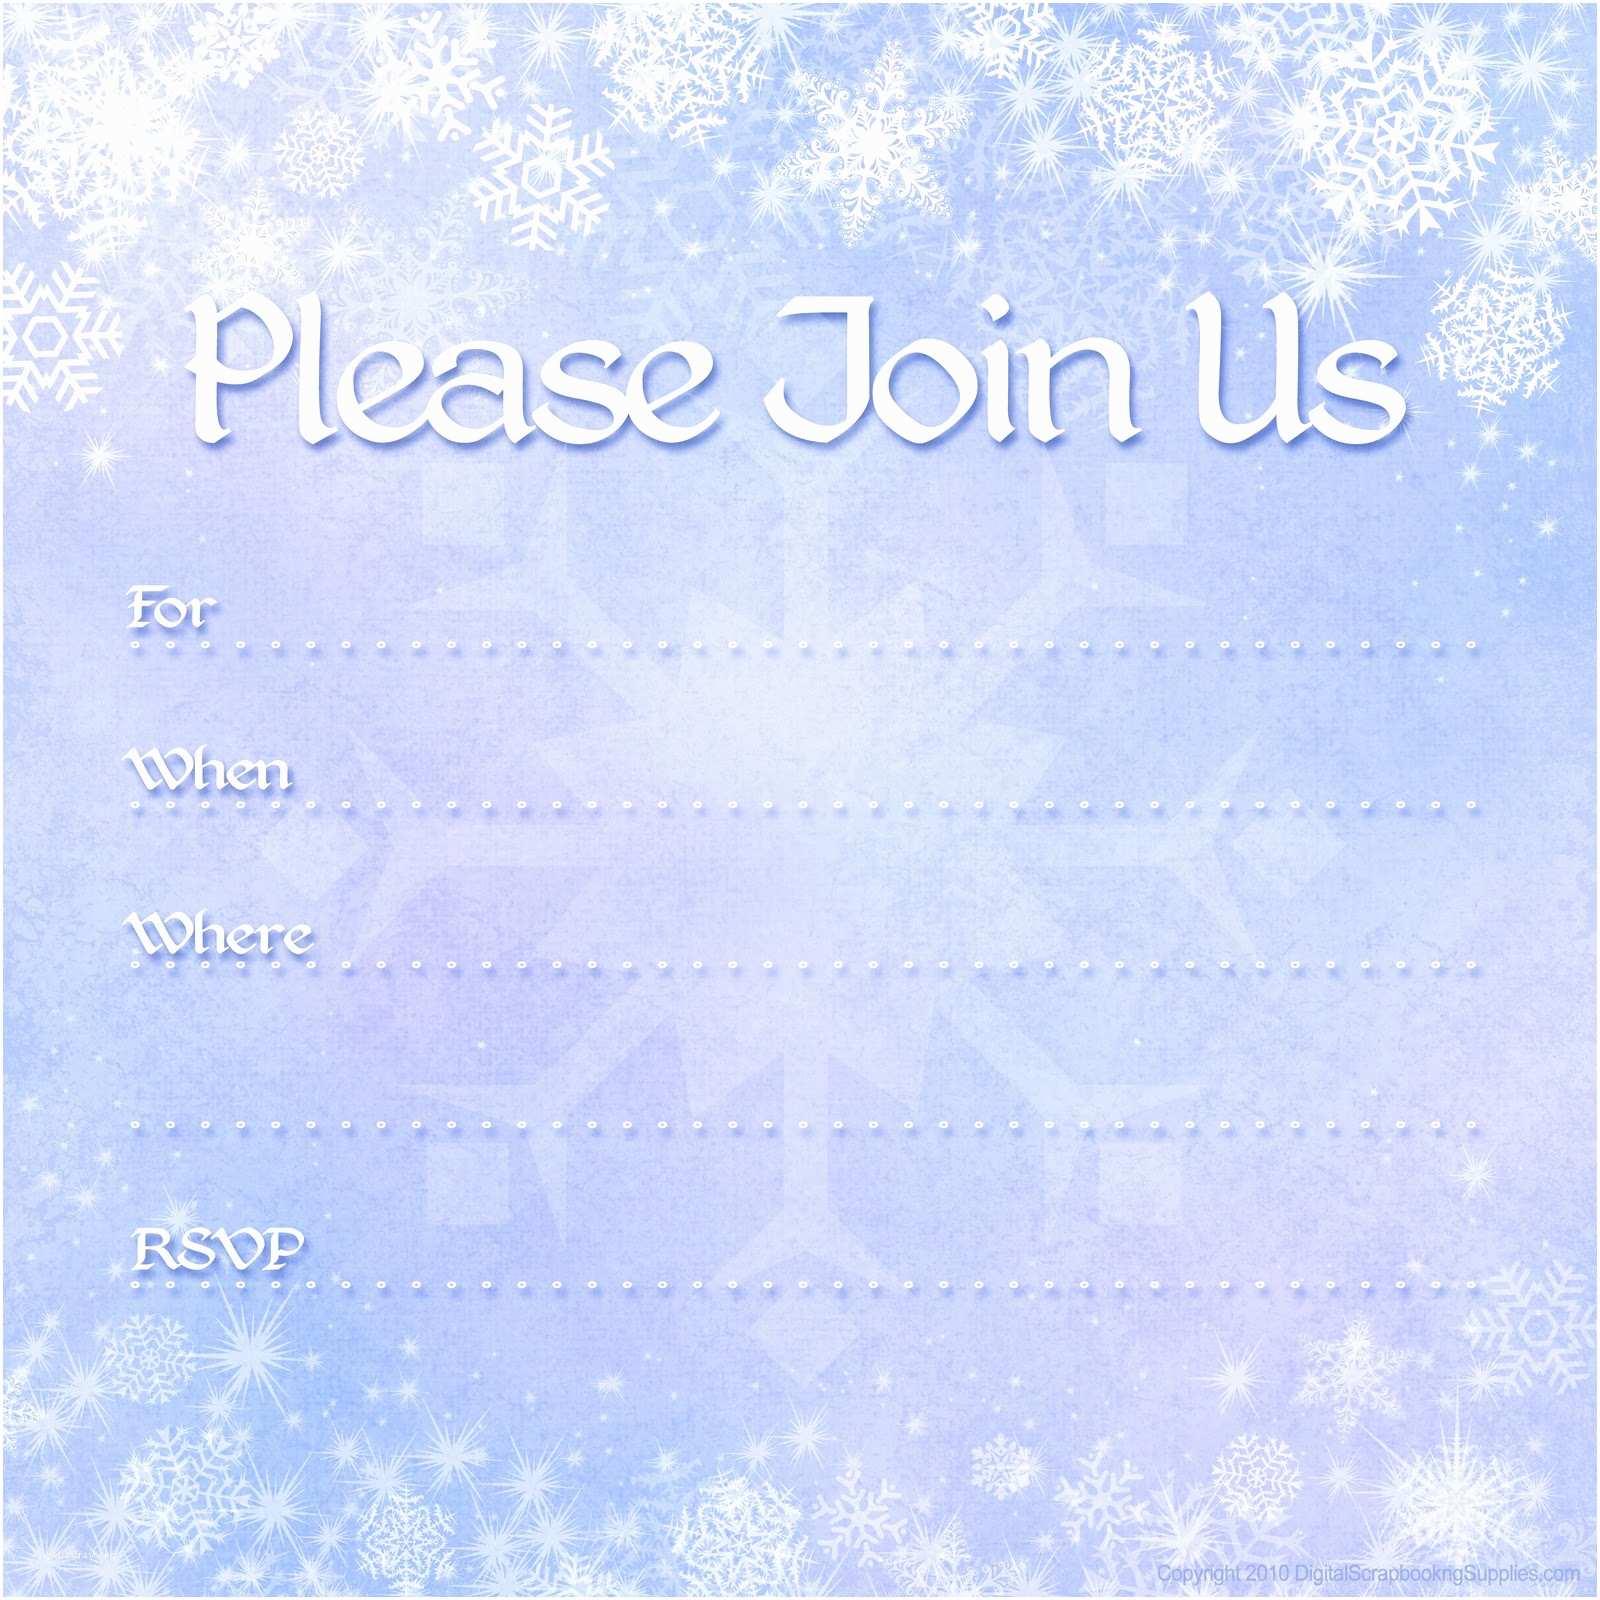 Free Holiday Party Invitation Templates Free Printable Party Invitations Free Winter Holiday